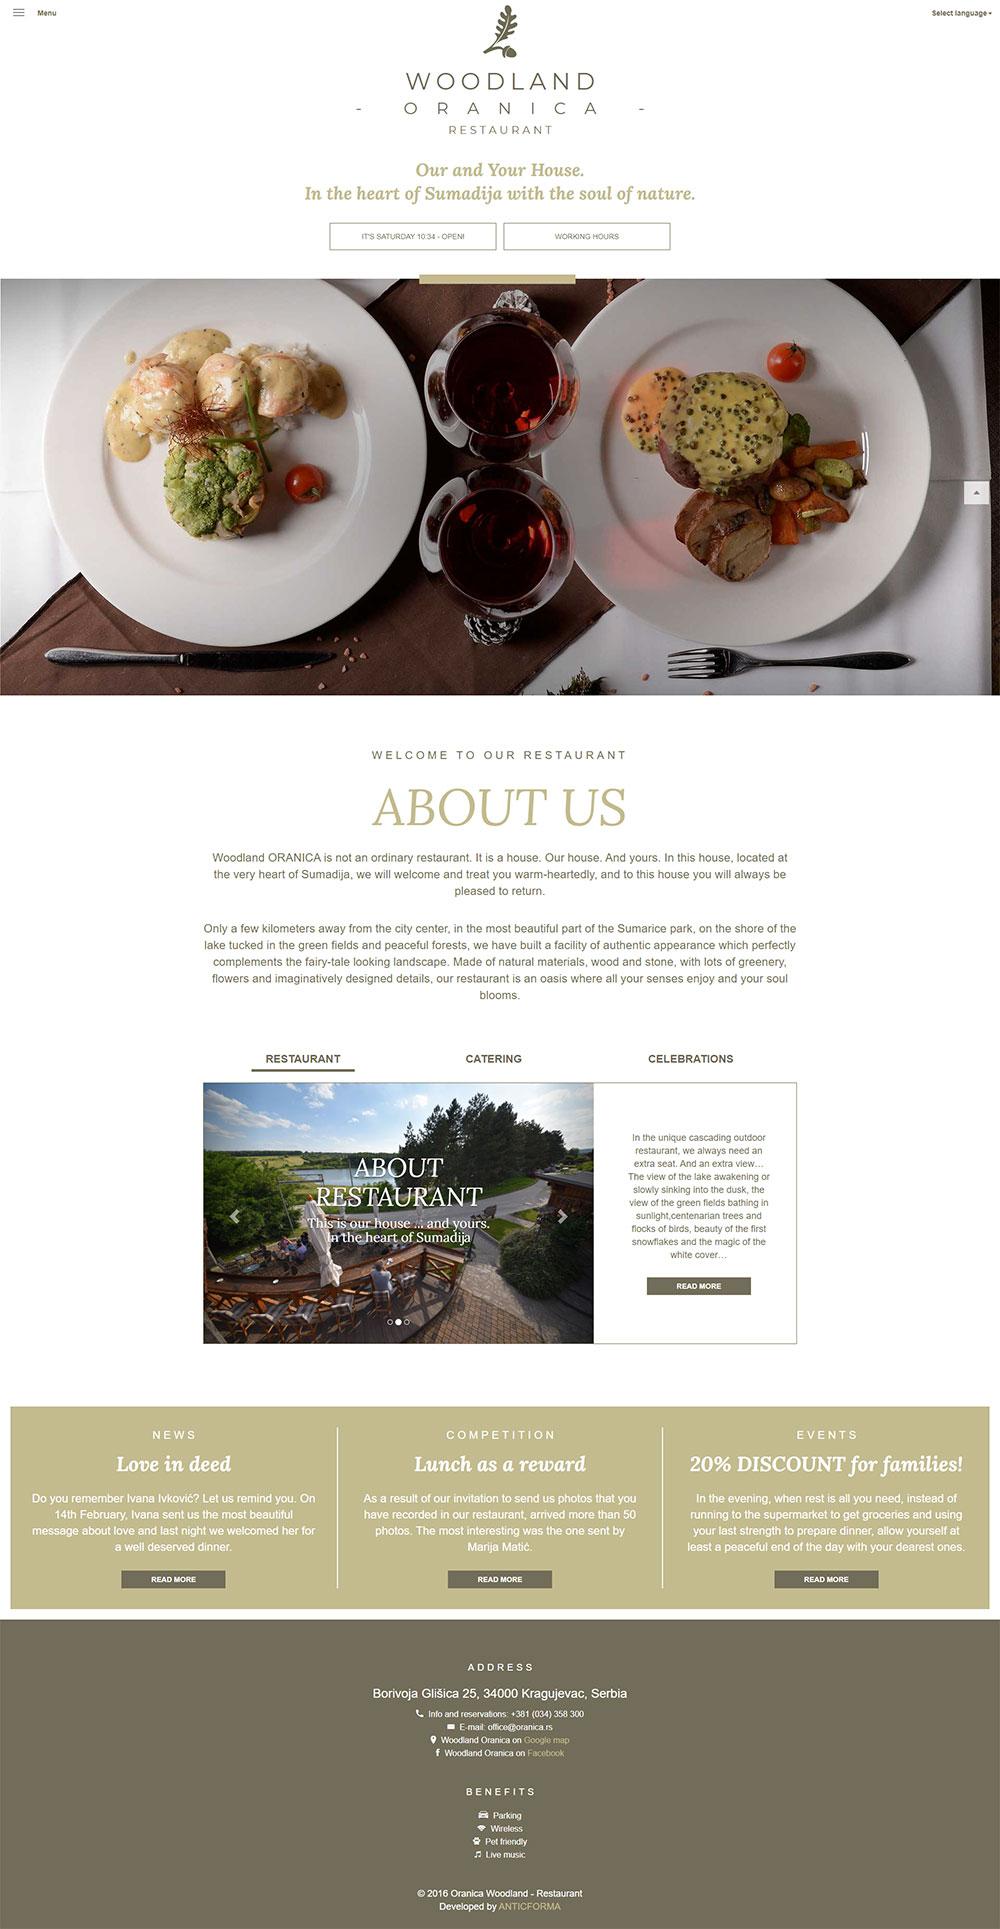 Restaurant Oranica website screenshot